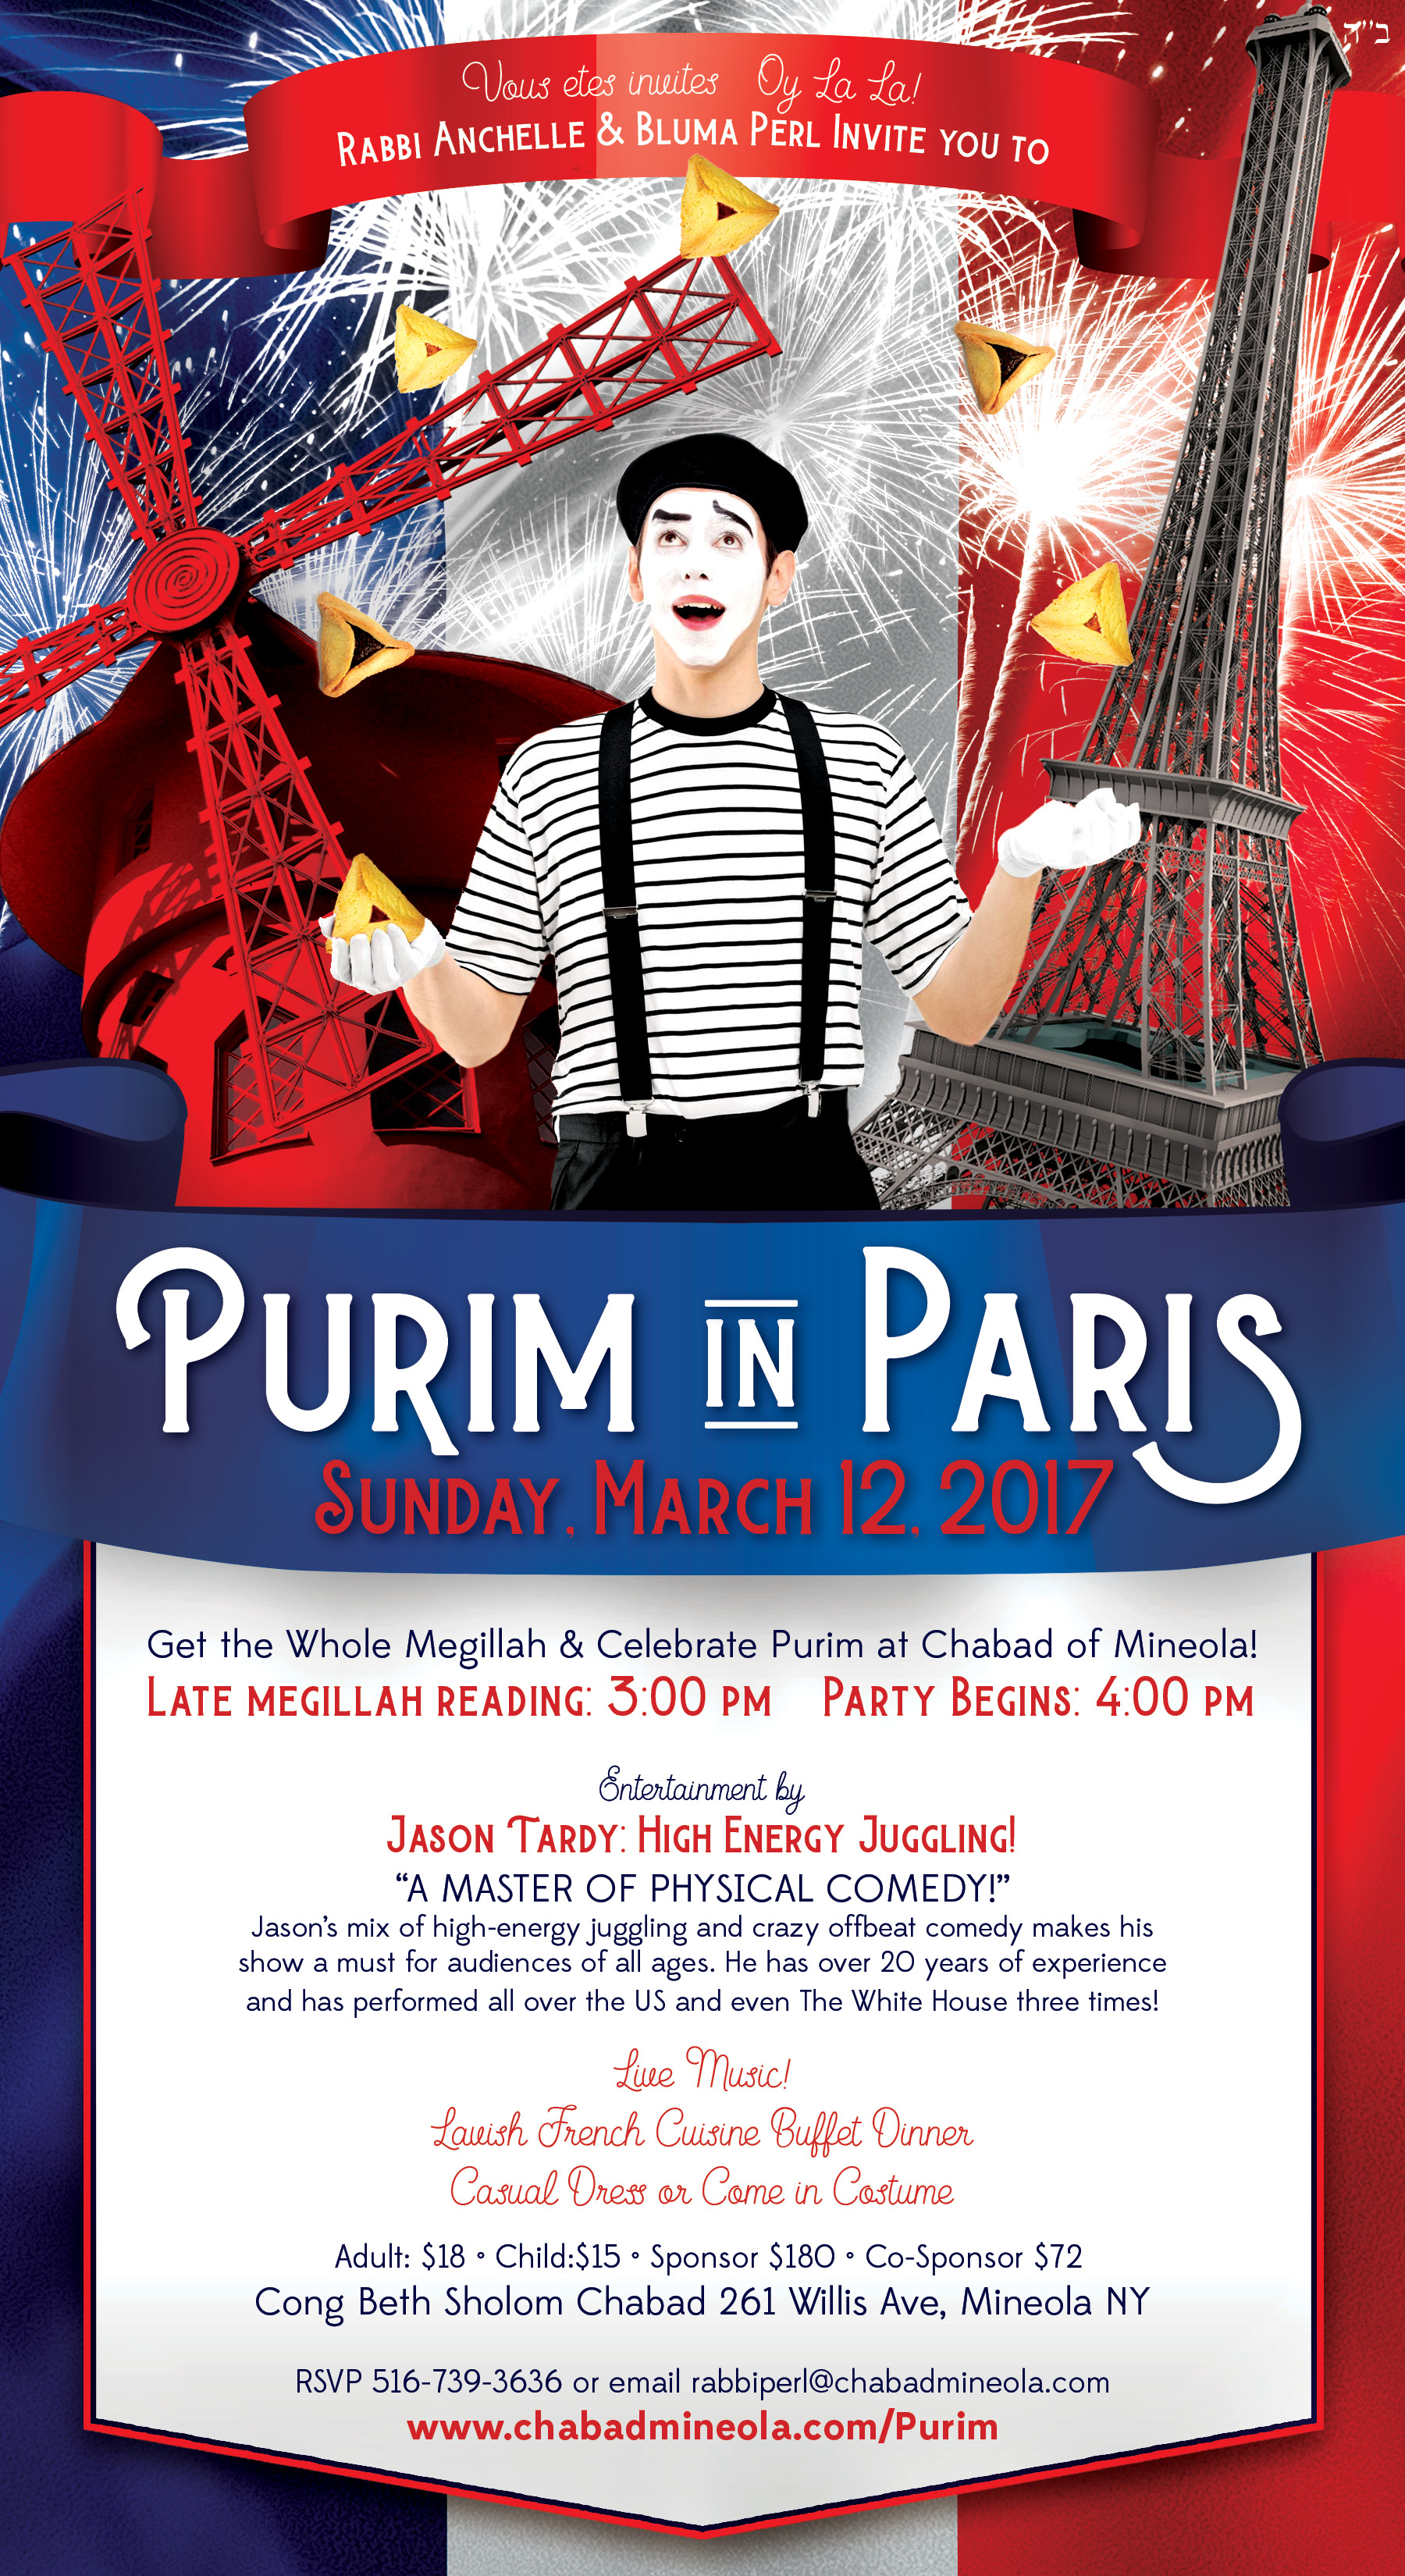 Purim in Paris Chabad Mineola Celebration